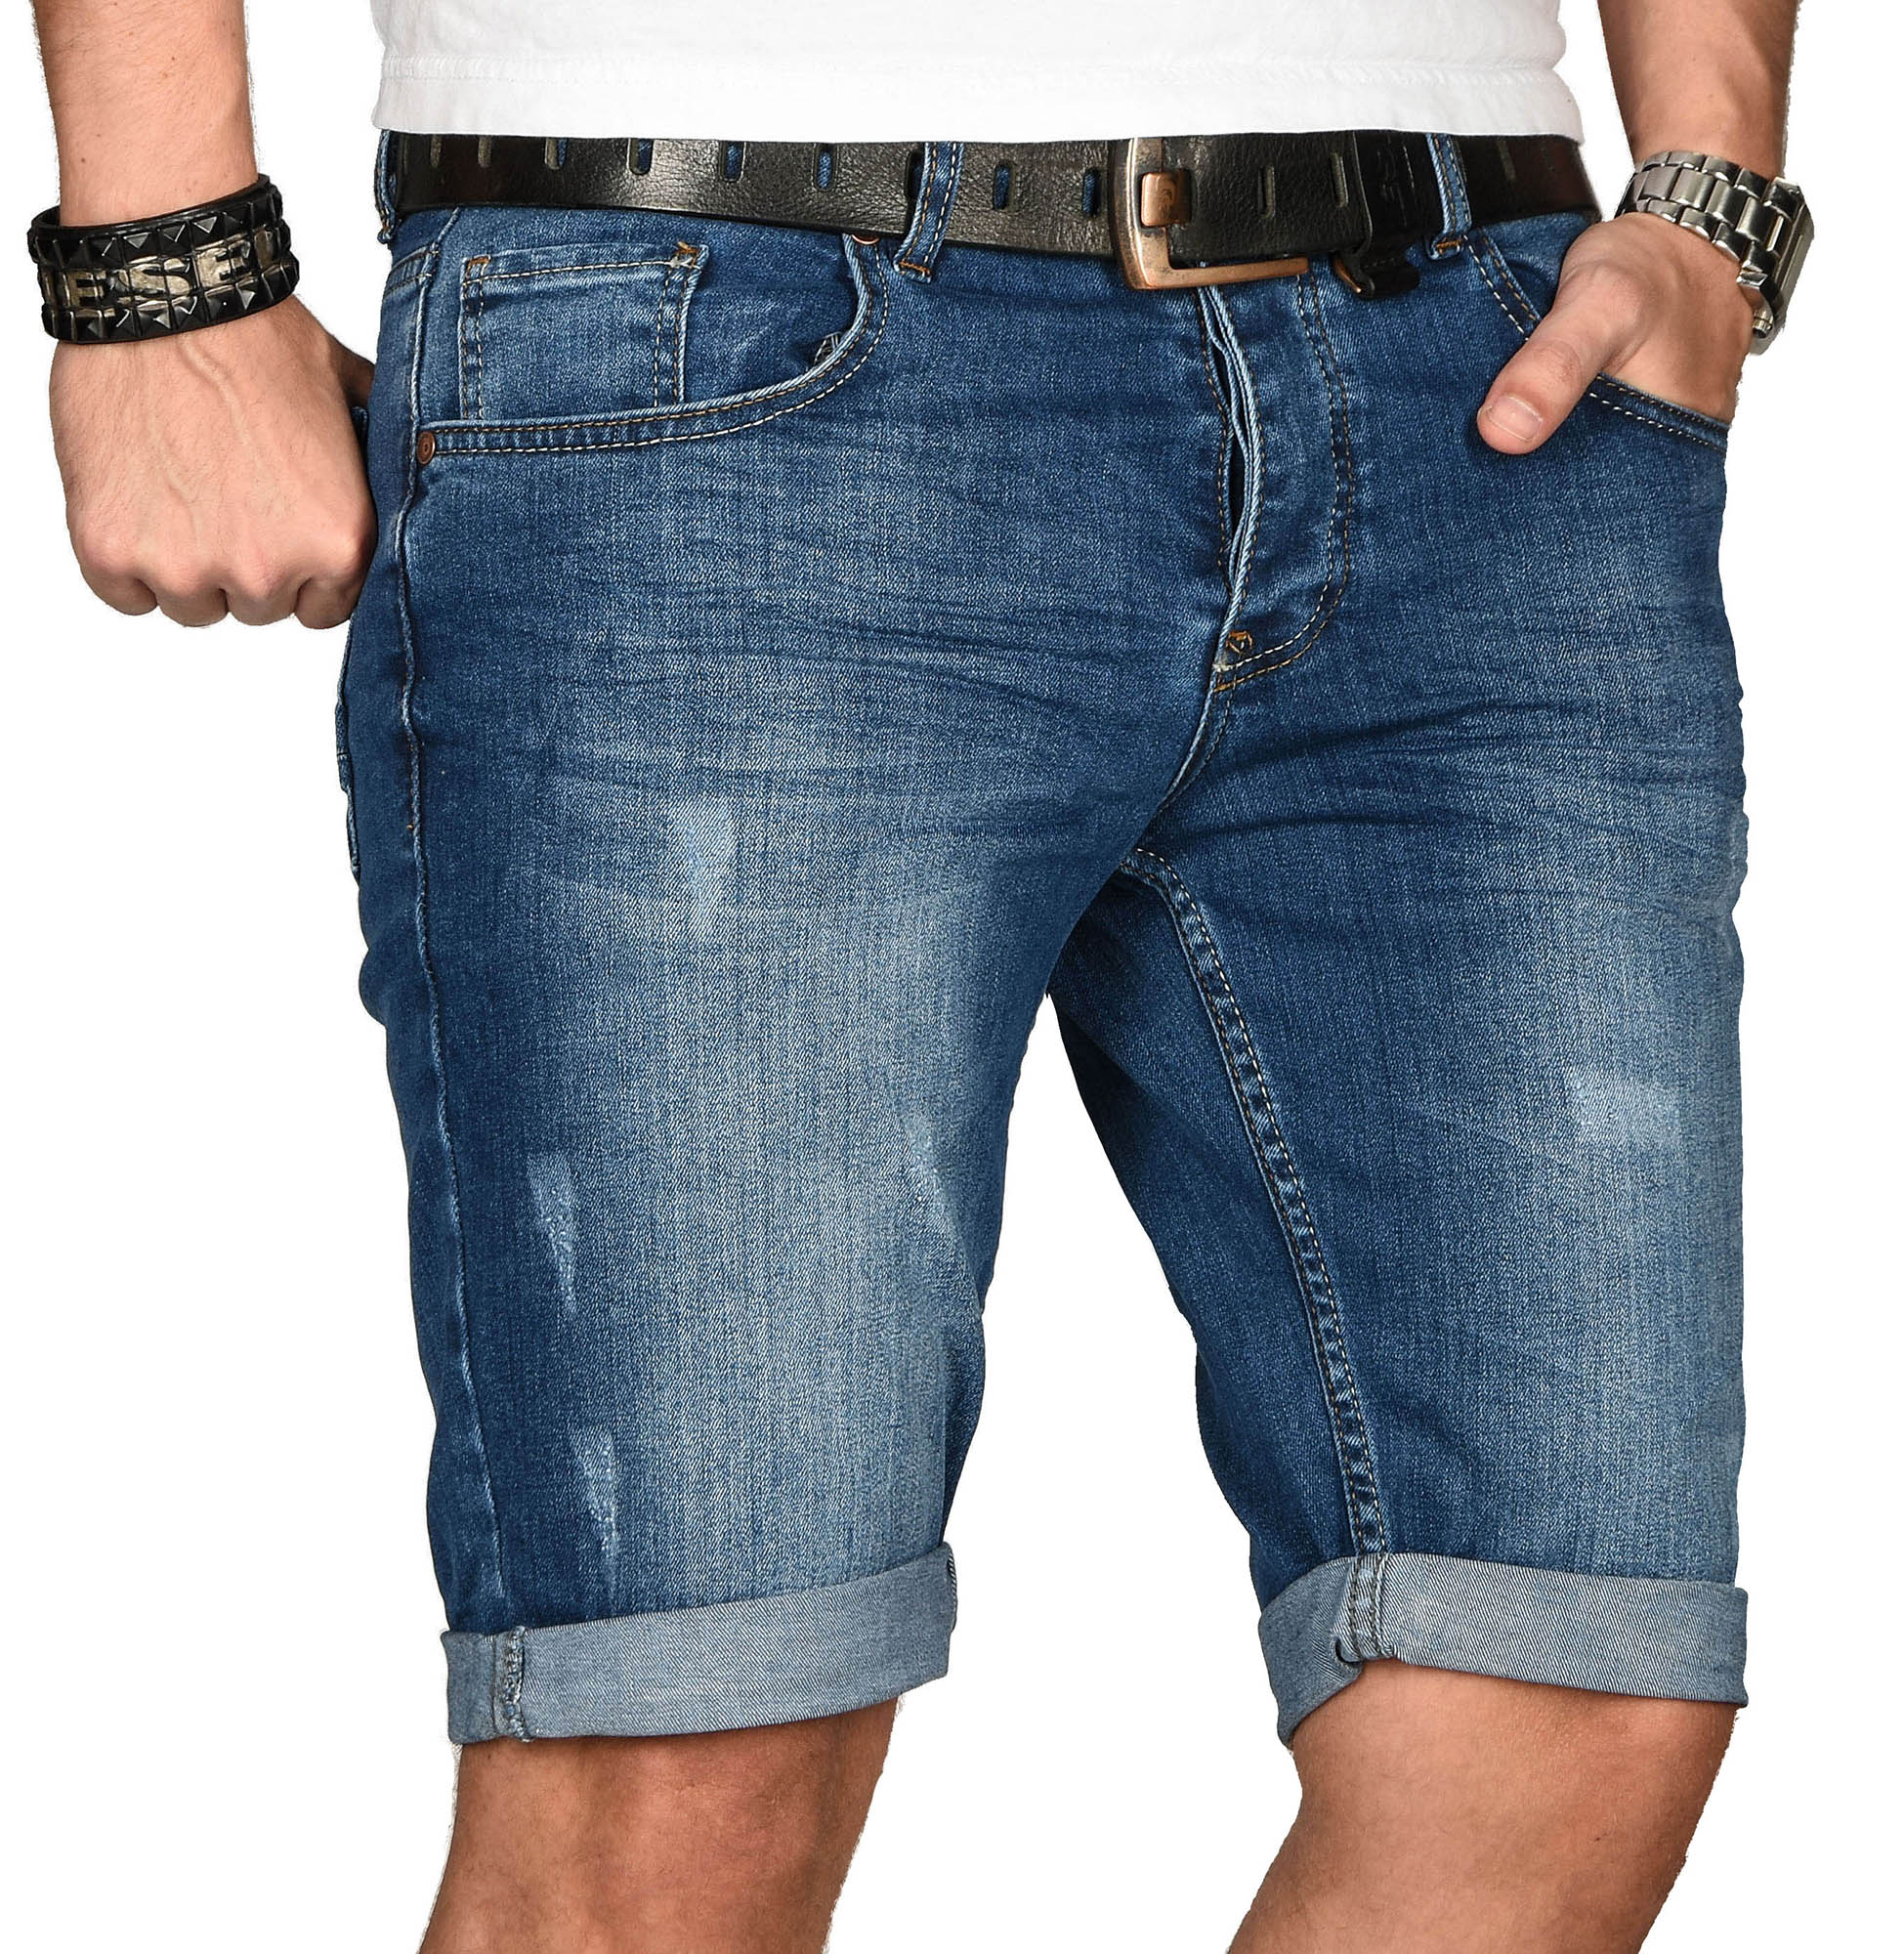 A-Salvarini-Herren-Designer-Jeans-Short-kurze-Hose-Slim-Sommer-Shorts-Bermuda Indexbild 21